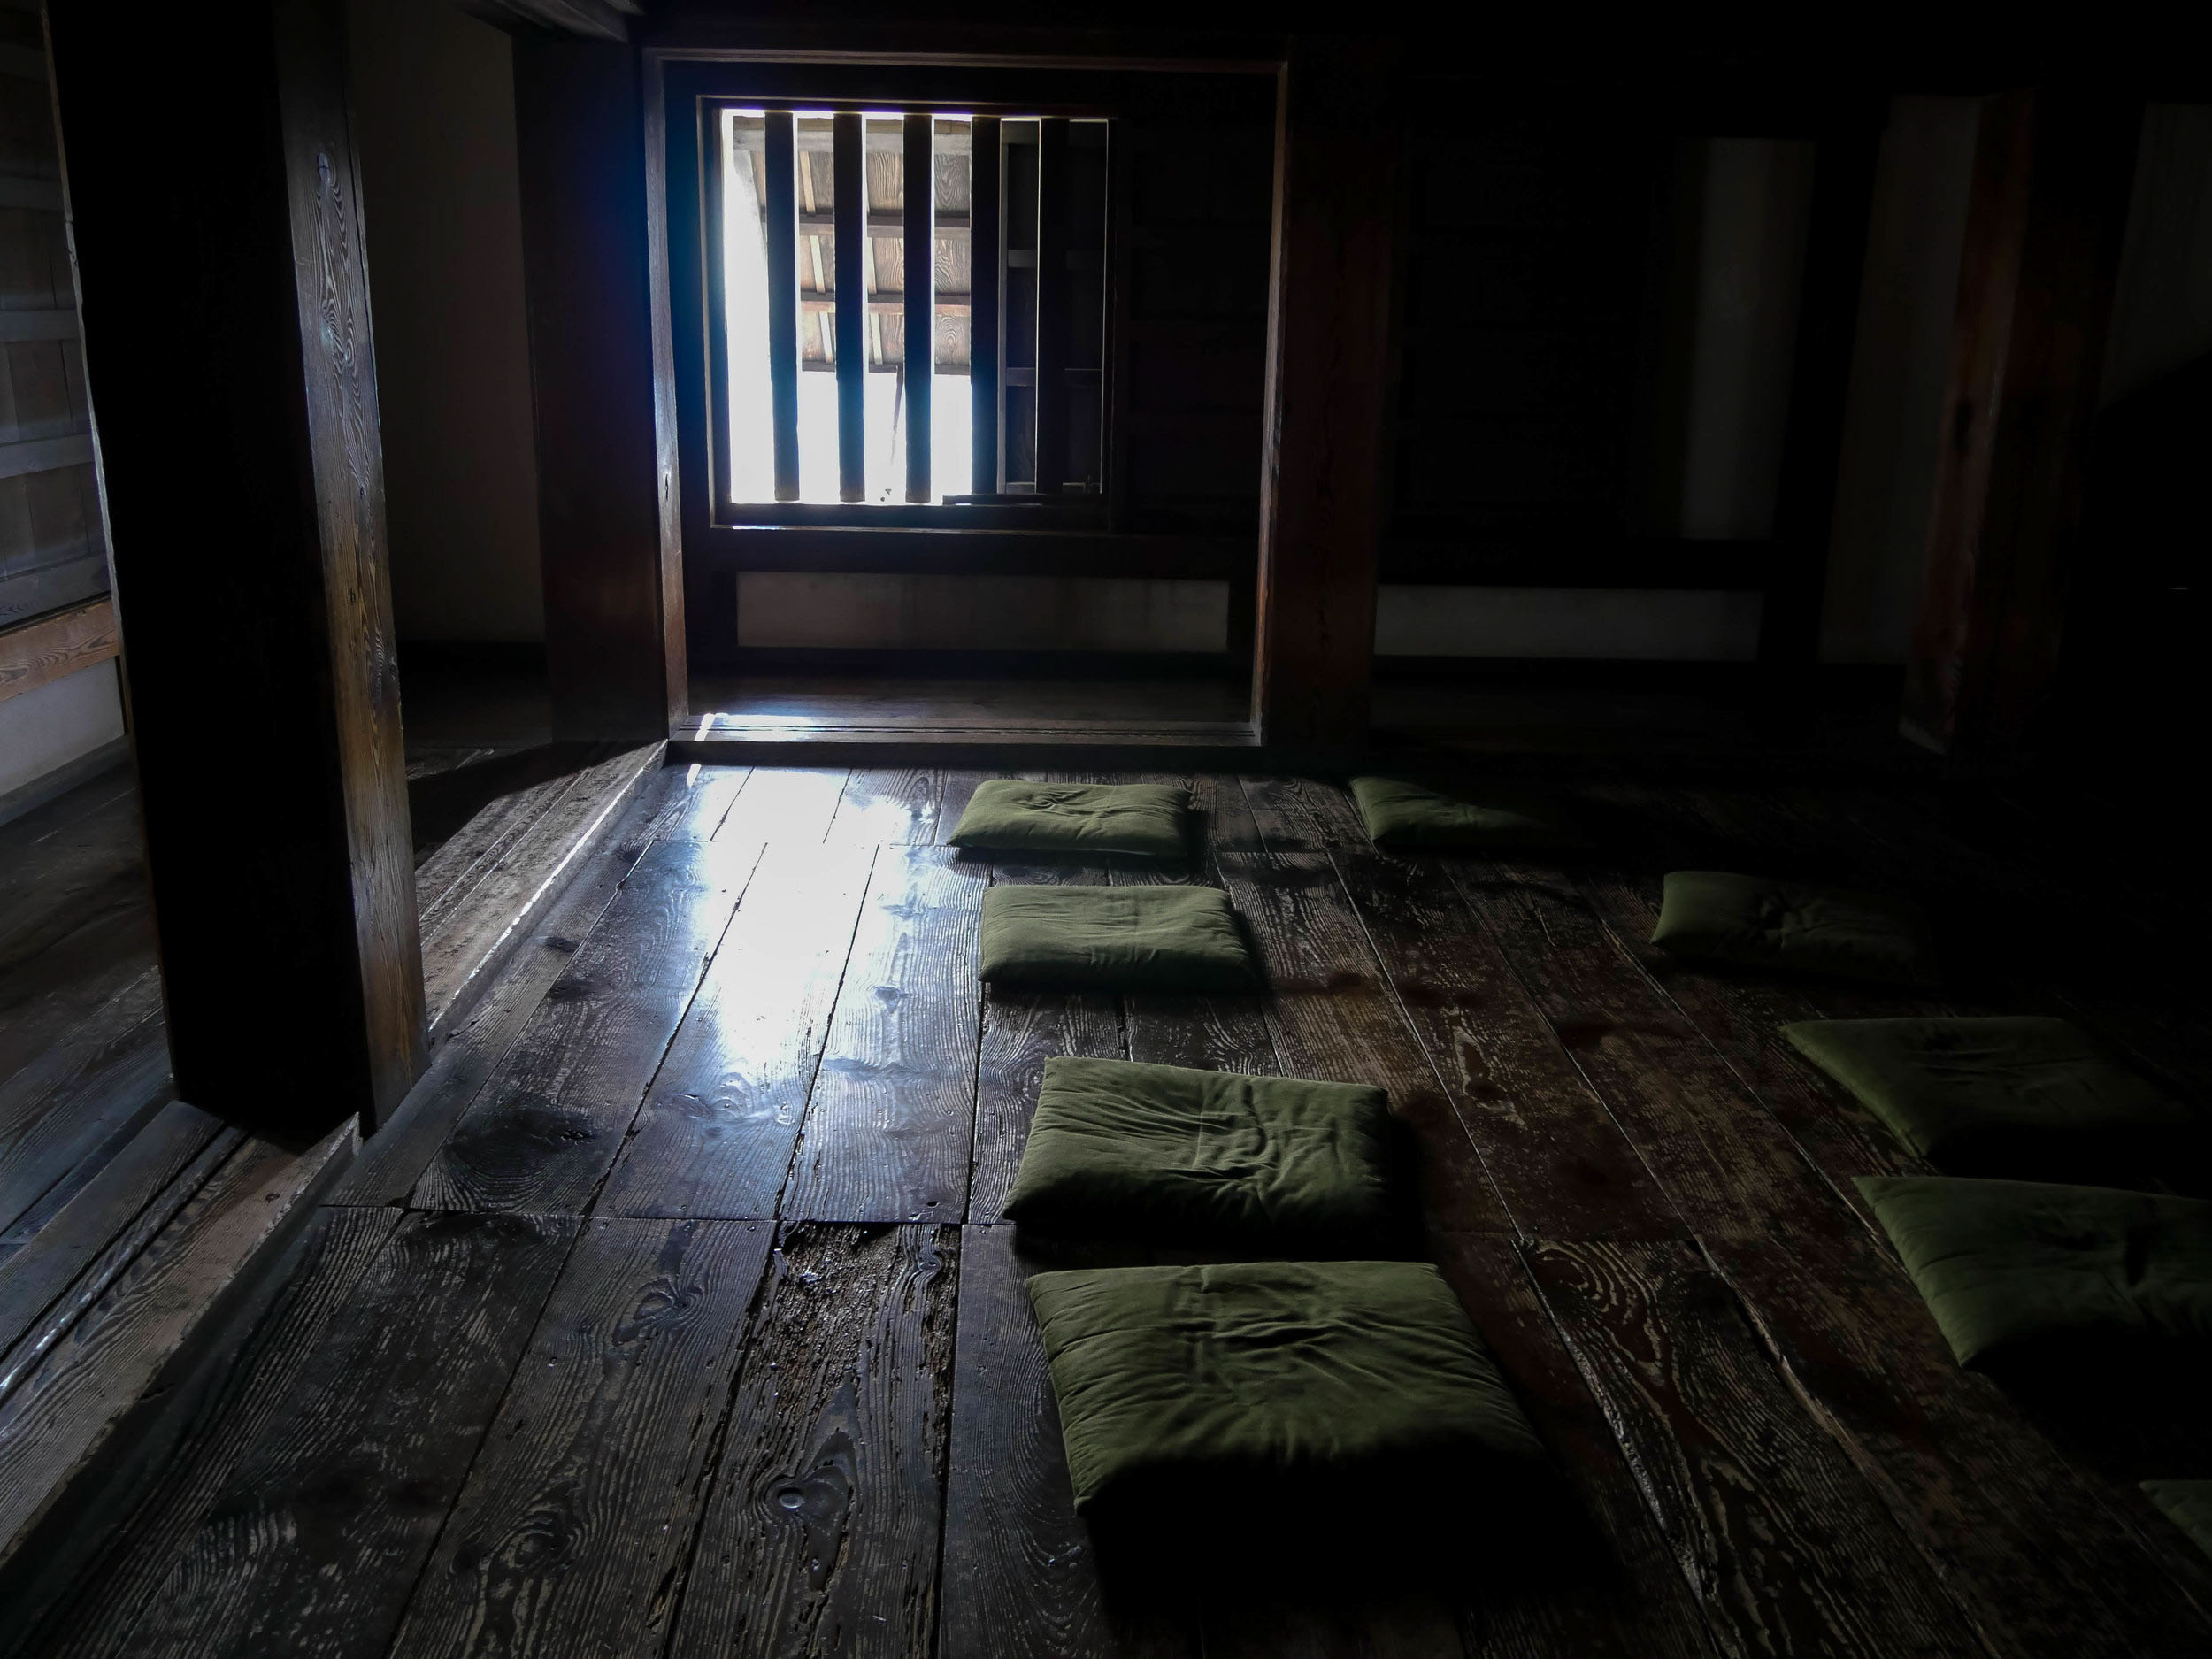 matsuyama-dougo-onsen-15.jpg